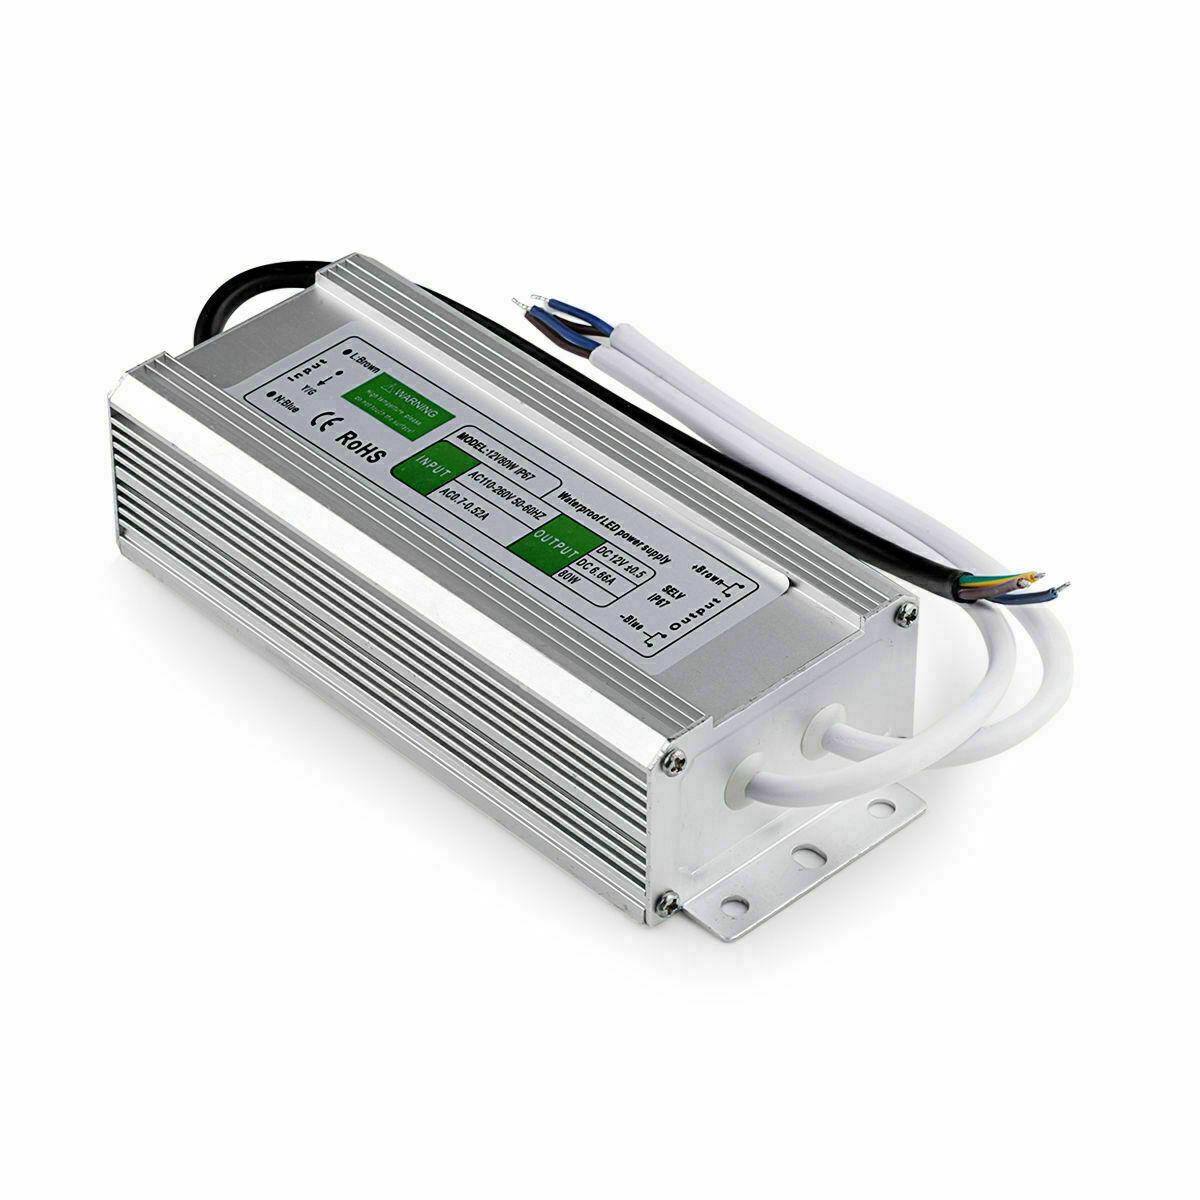 12V 24V Waterproof LED Driver Power Supply Transformer PSU - IP67 10-300 W